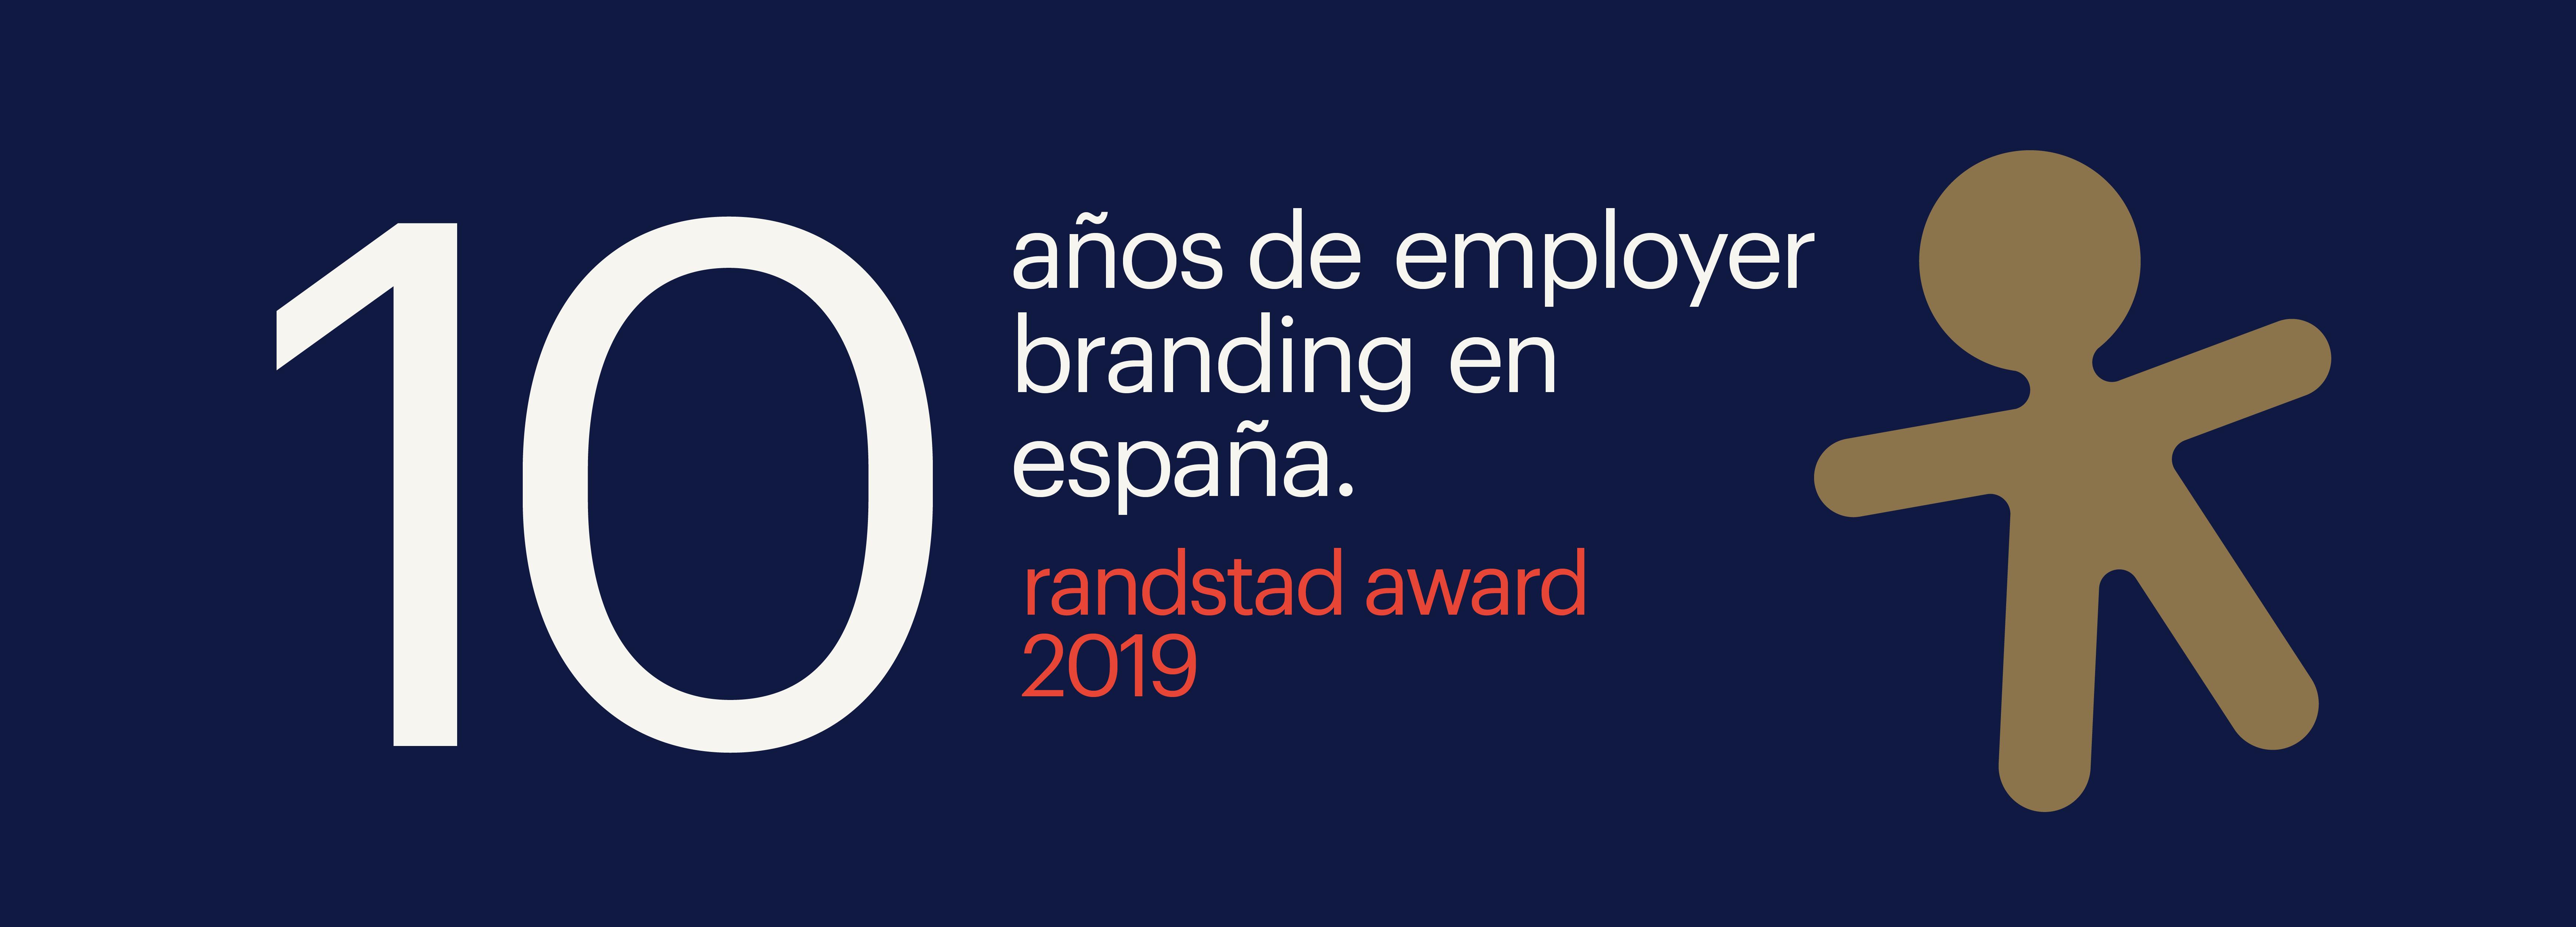 banner header home employer branding_randstad award 2019_deskstop